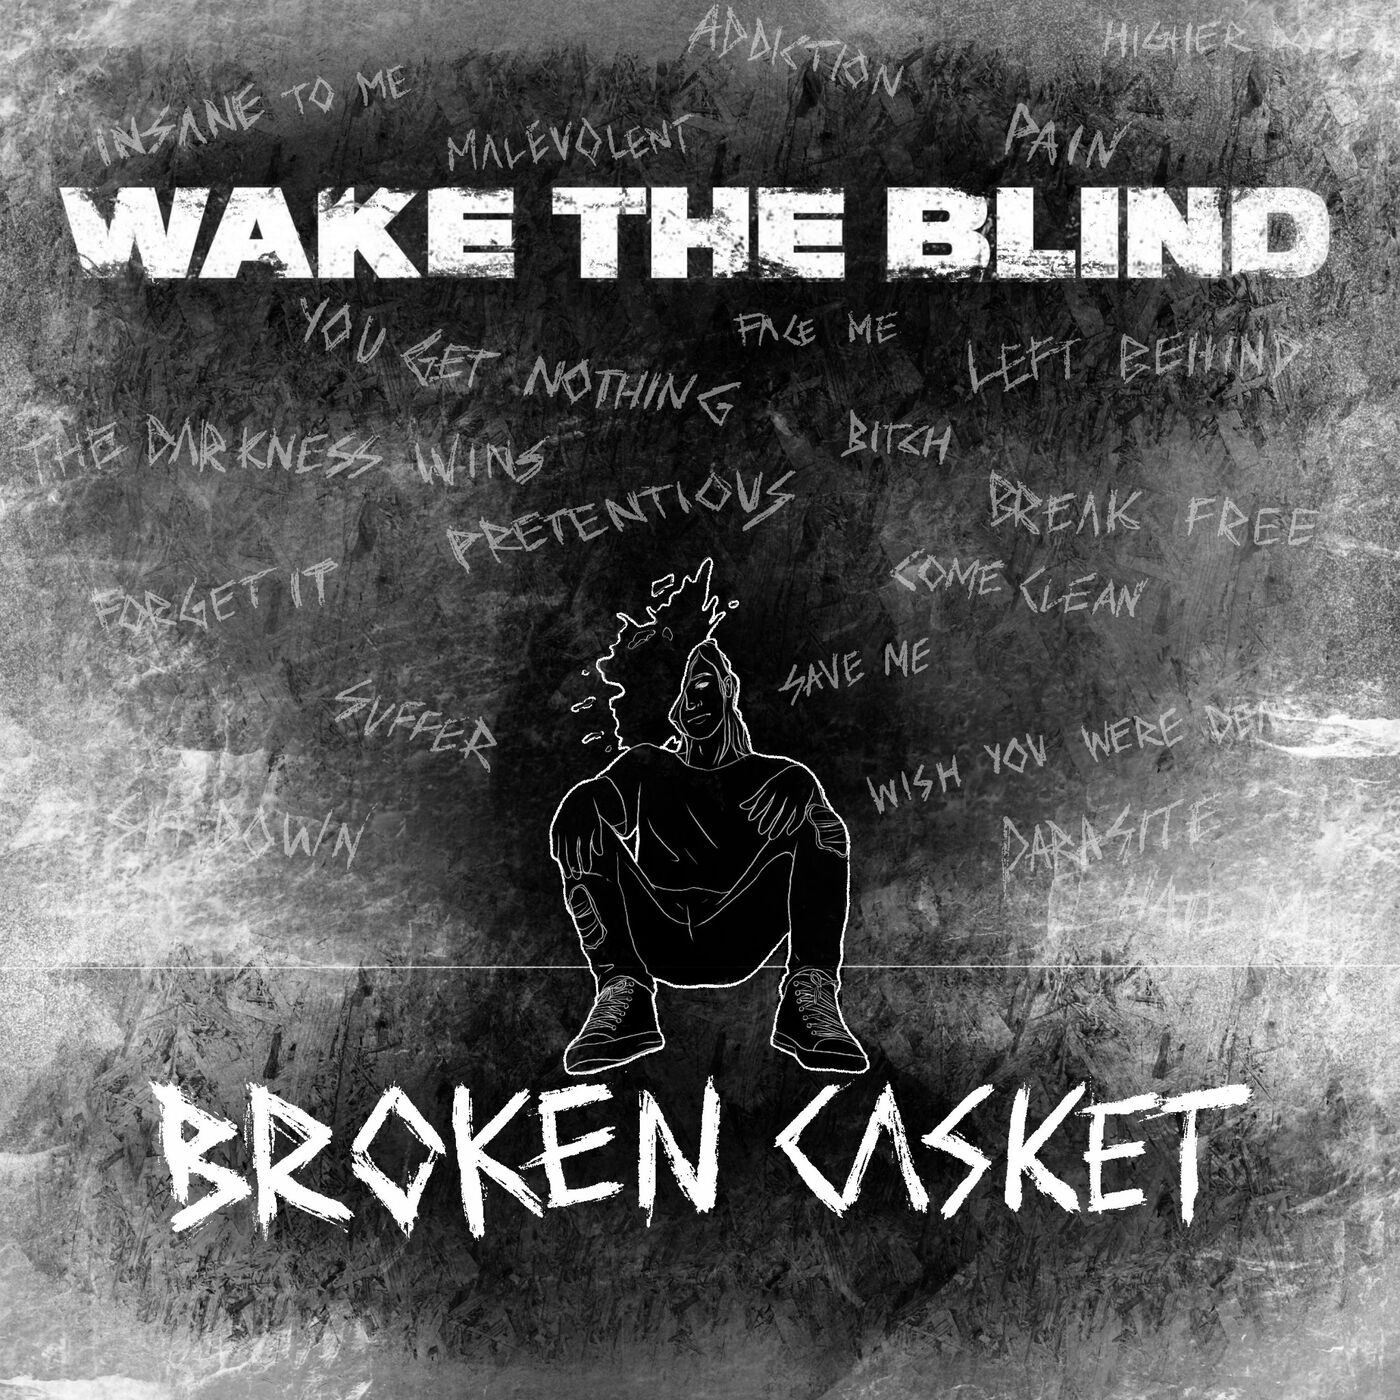 Wake the Blind - Broken Casket [EP] (2020)